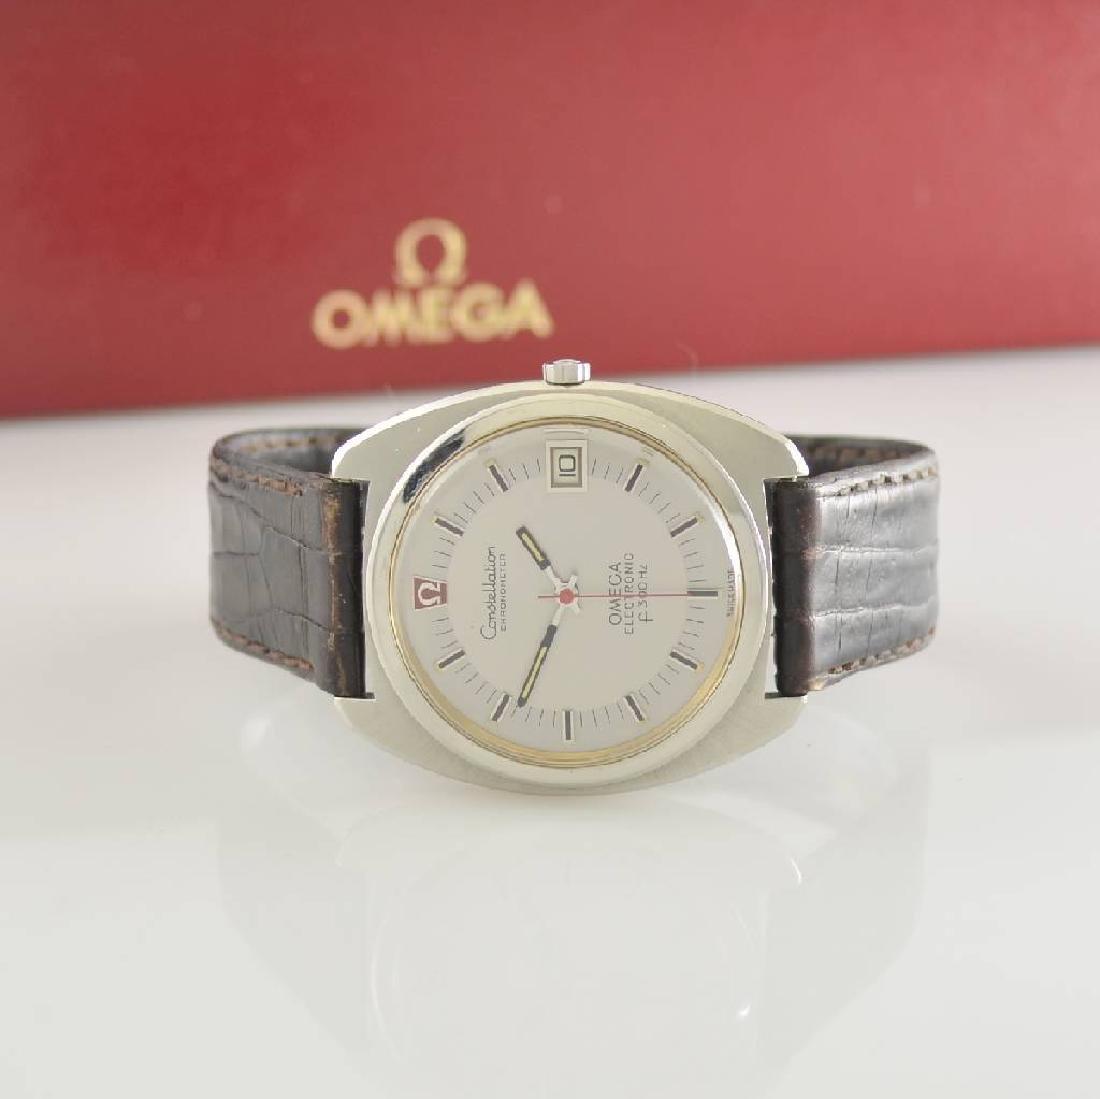 OMEGA Constellation chronometer electronic f300Hz